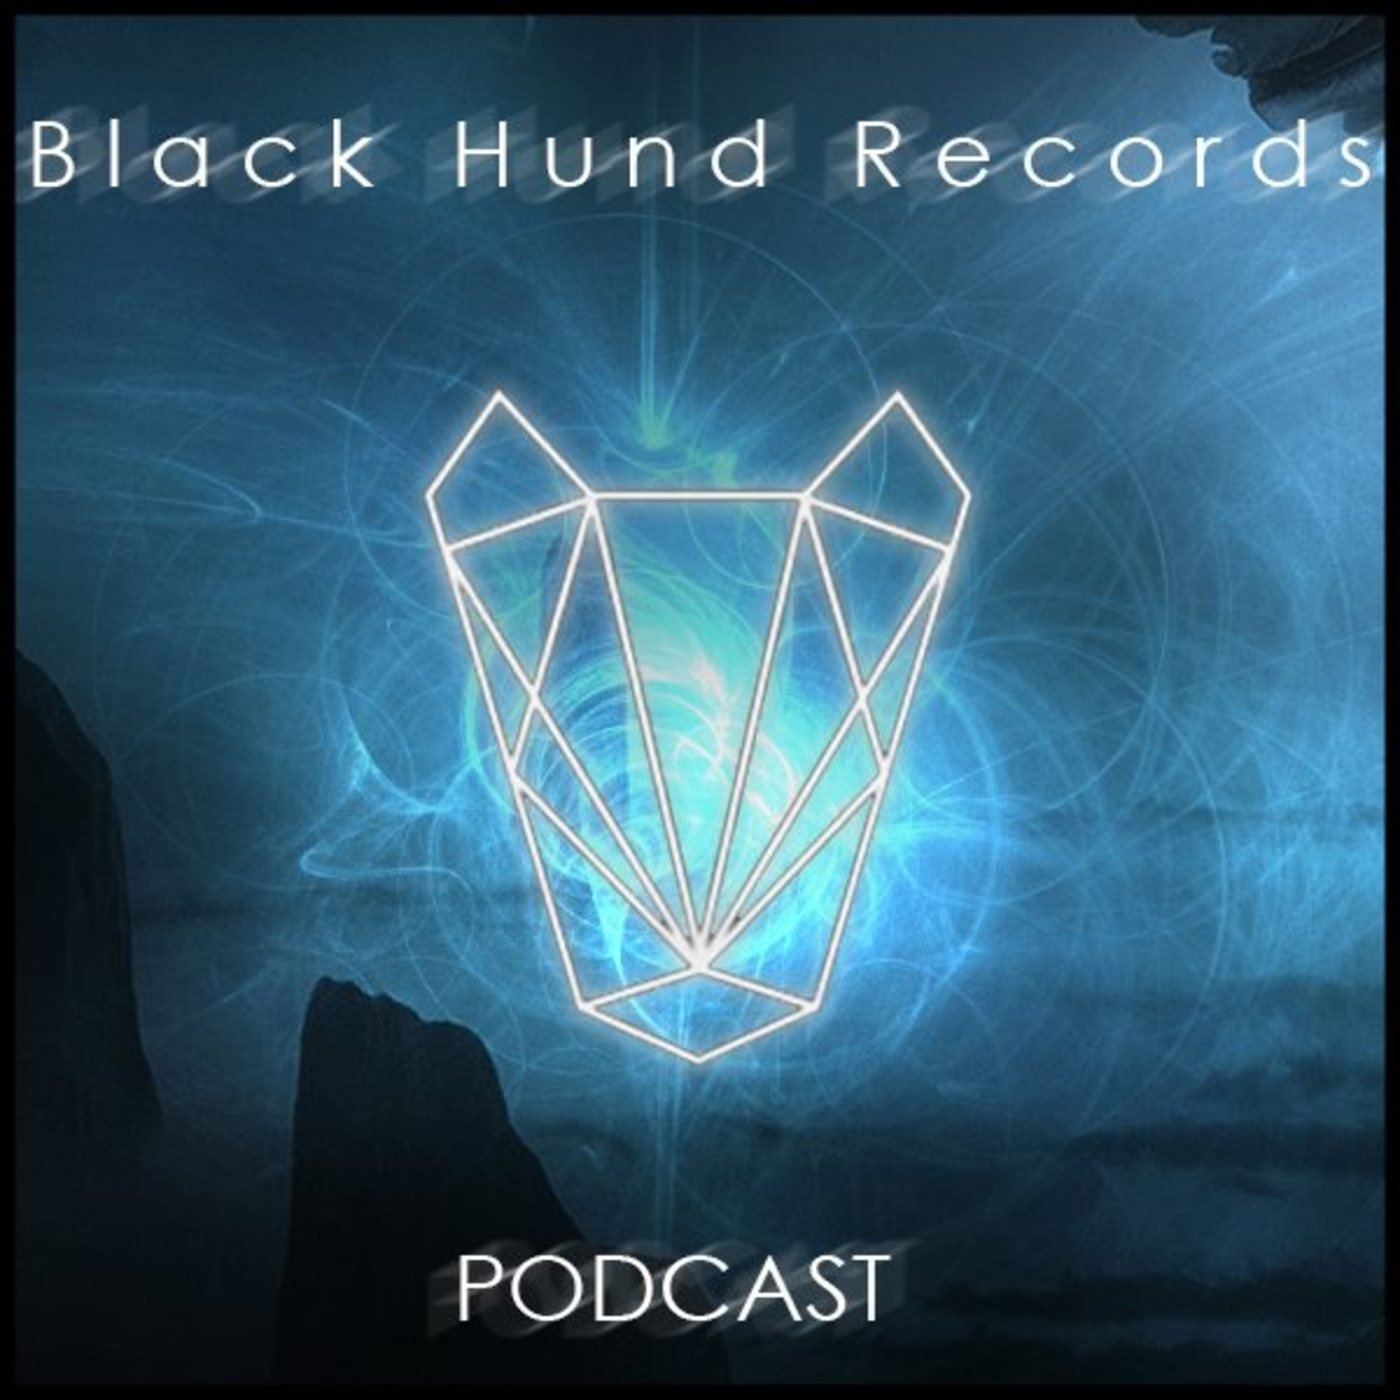 <![CDATA[Black Hund Records Podcast]]>